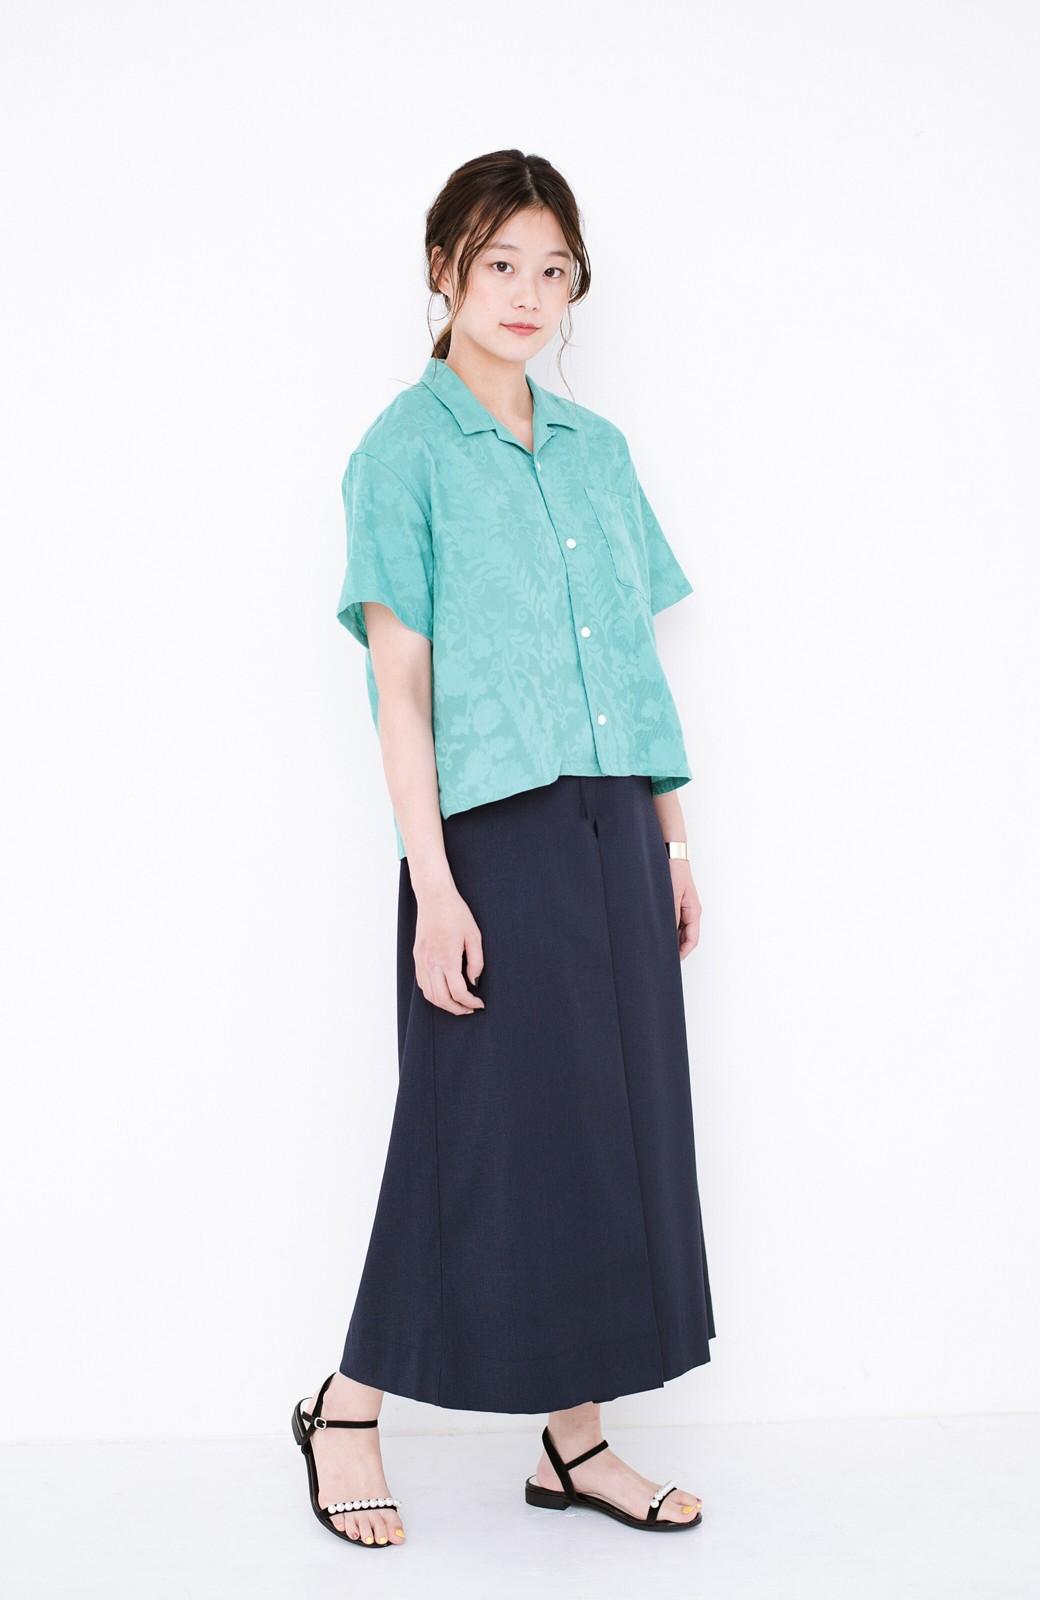 haco! 【今年も再販!】京都の浴衣屋さんと作った浴衣生地のシャツ <グリーン>の商品写真8